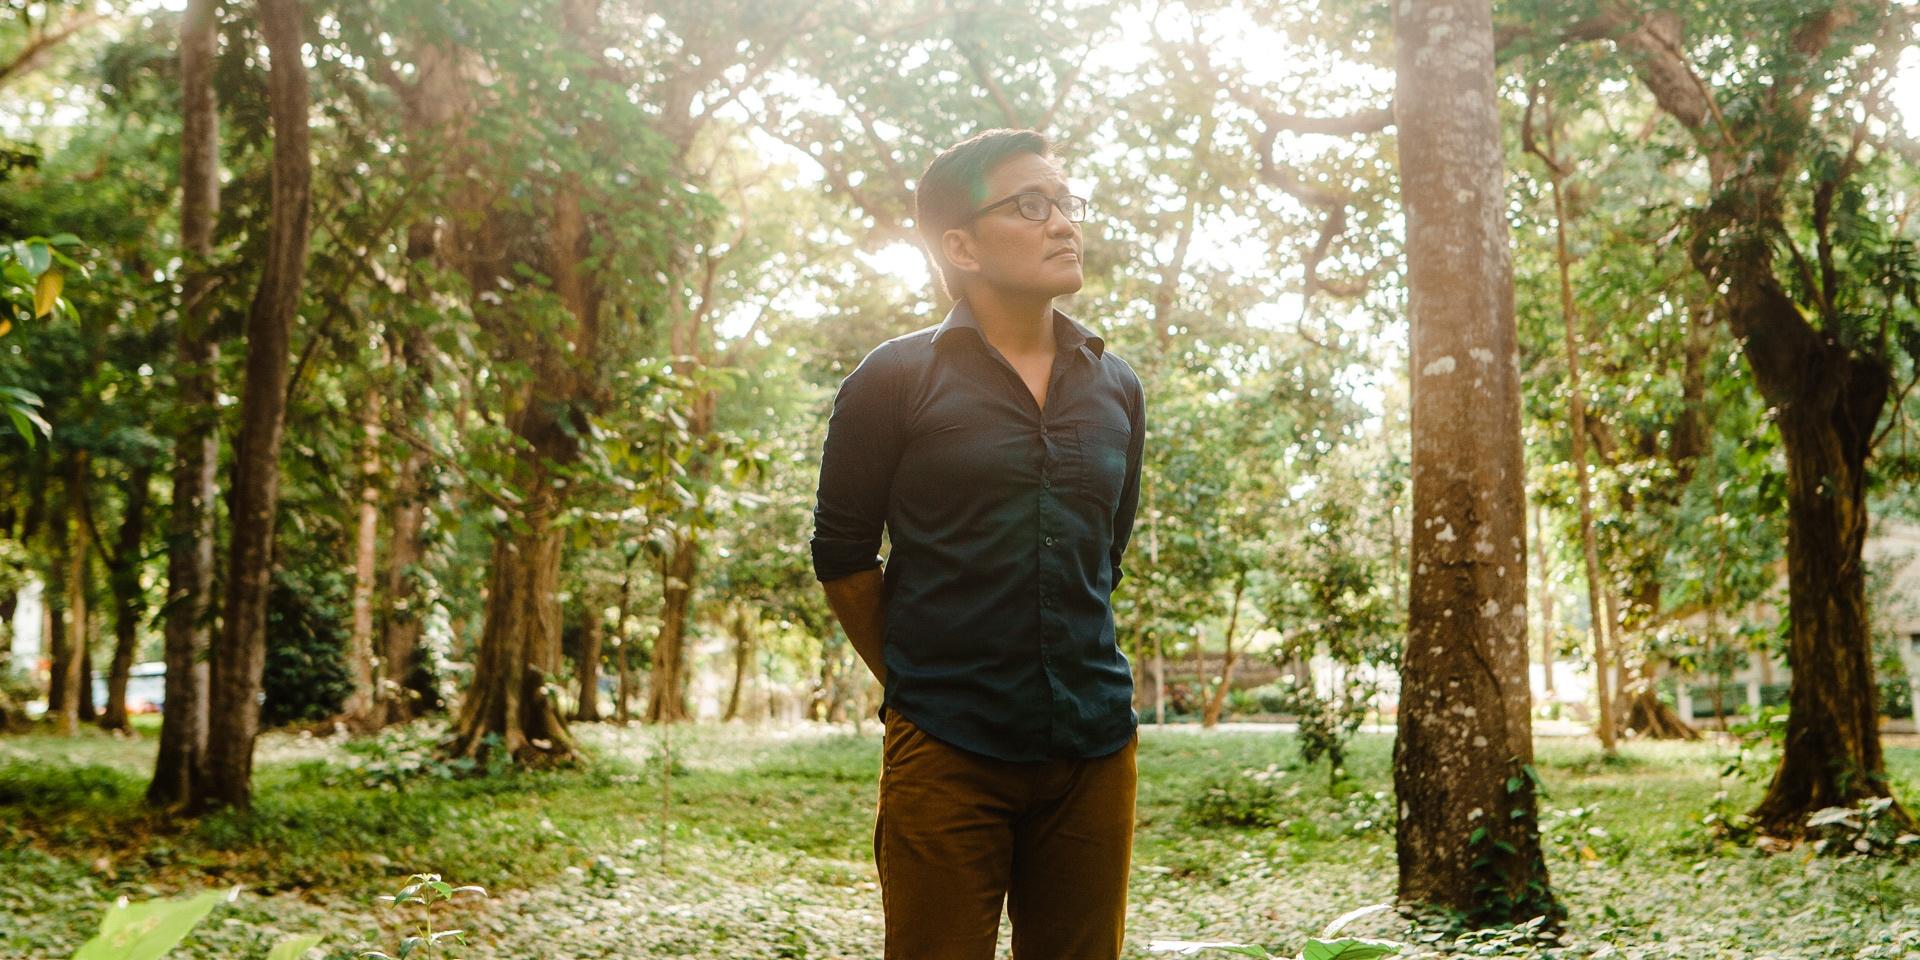 Ebe Dancel teases 'Hanggang Kailan Kita Mahihintay' his first single in years – watch